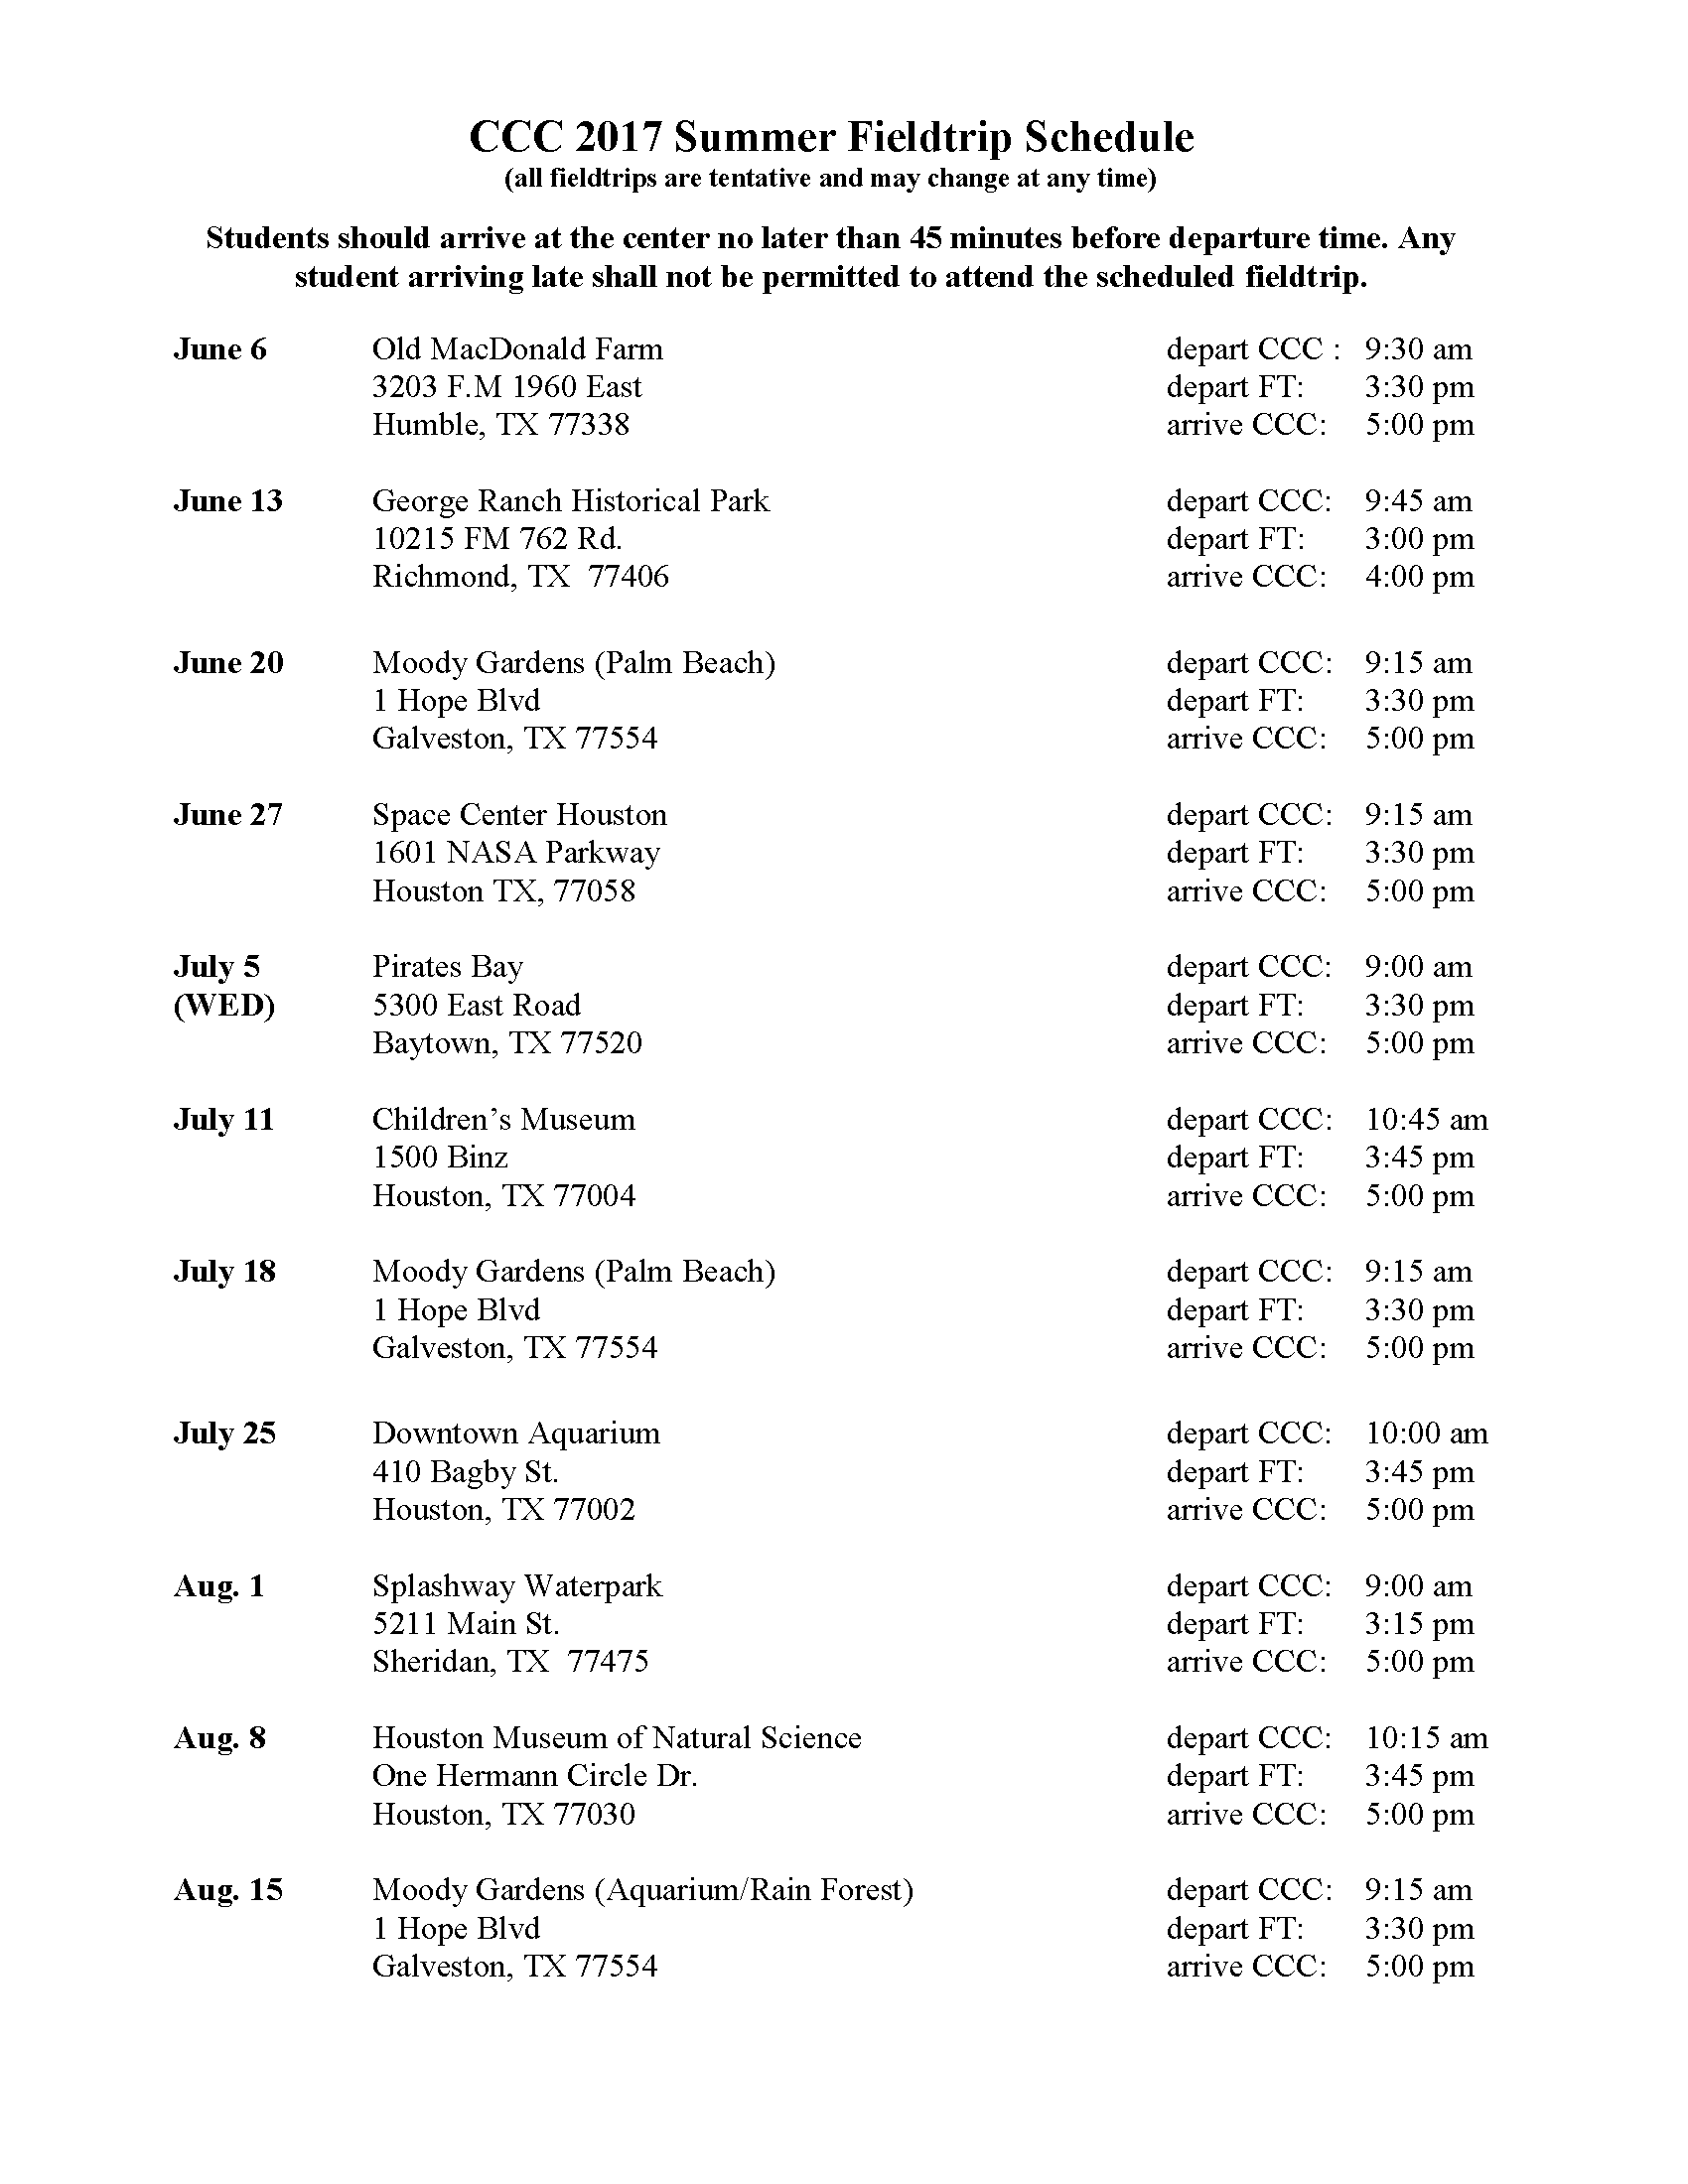 http://ccchouston.org/wp-content/uploads/2017/05/2017-Summer-Fieldtrip-Schedule_N.png